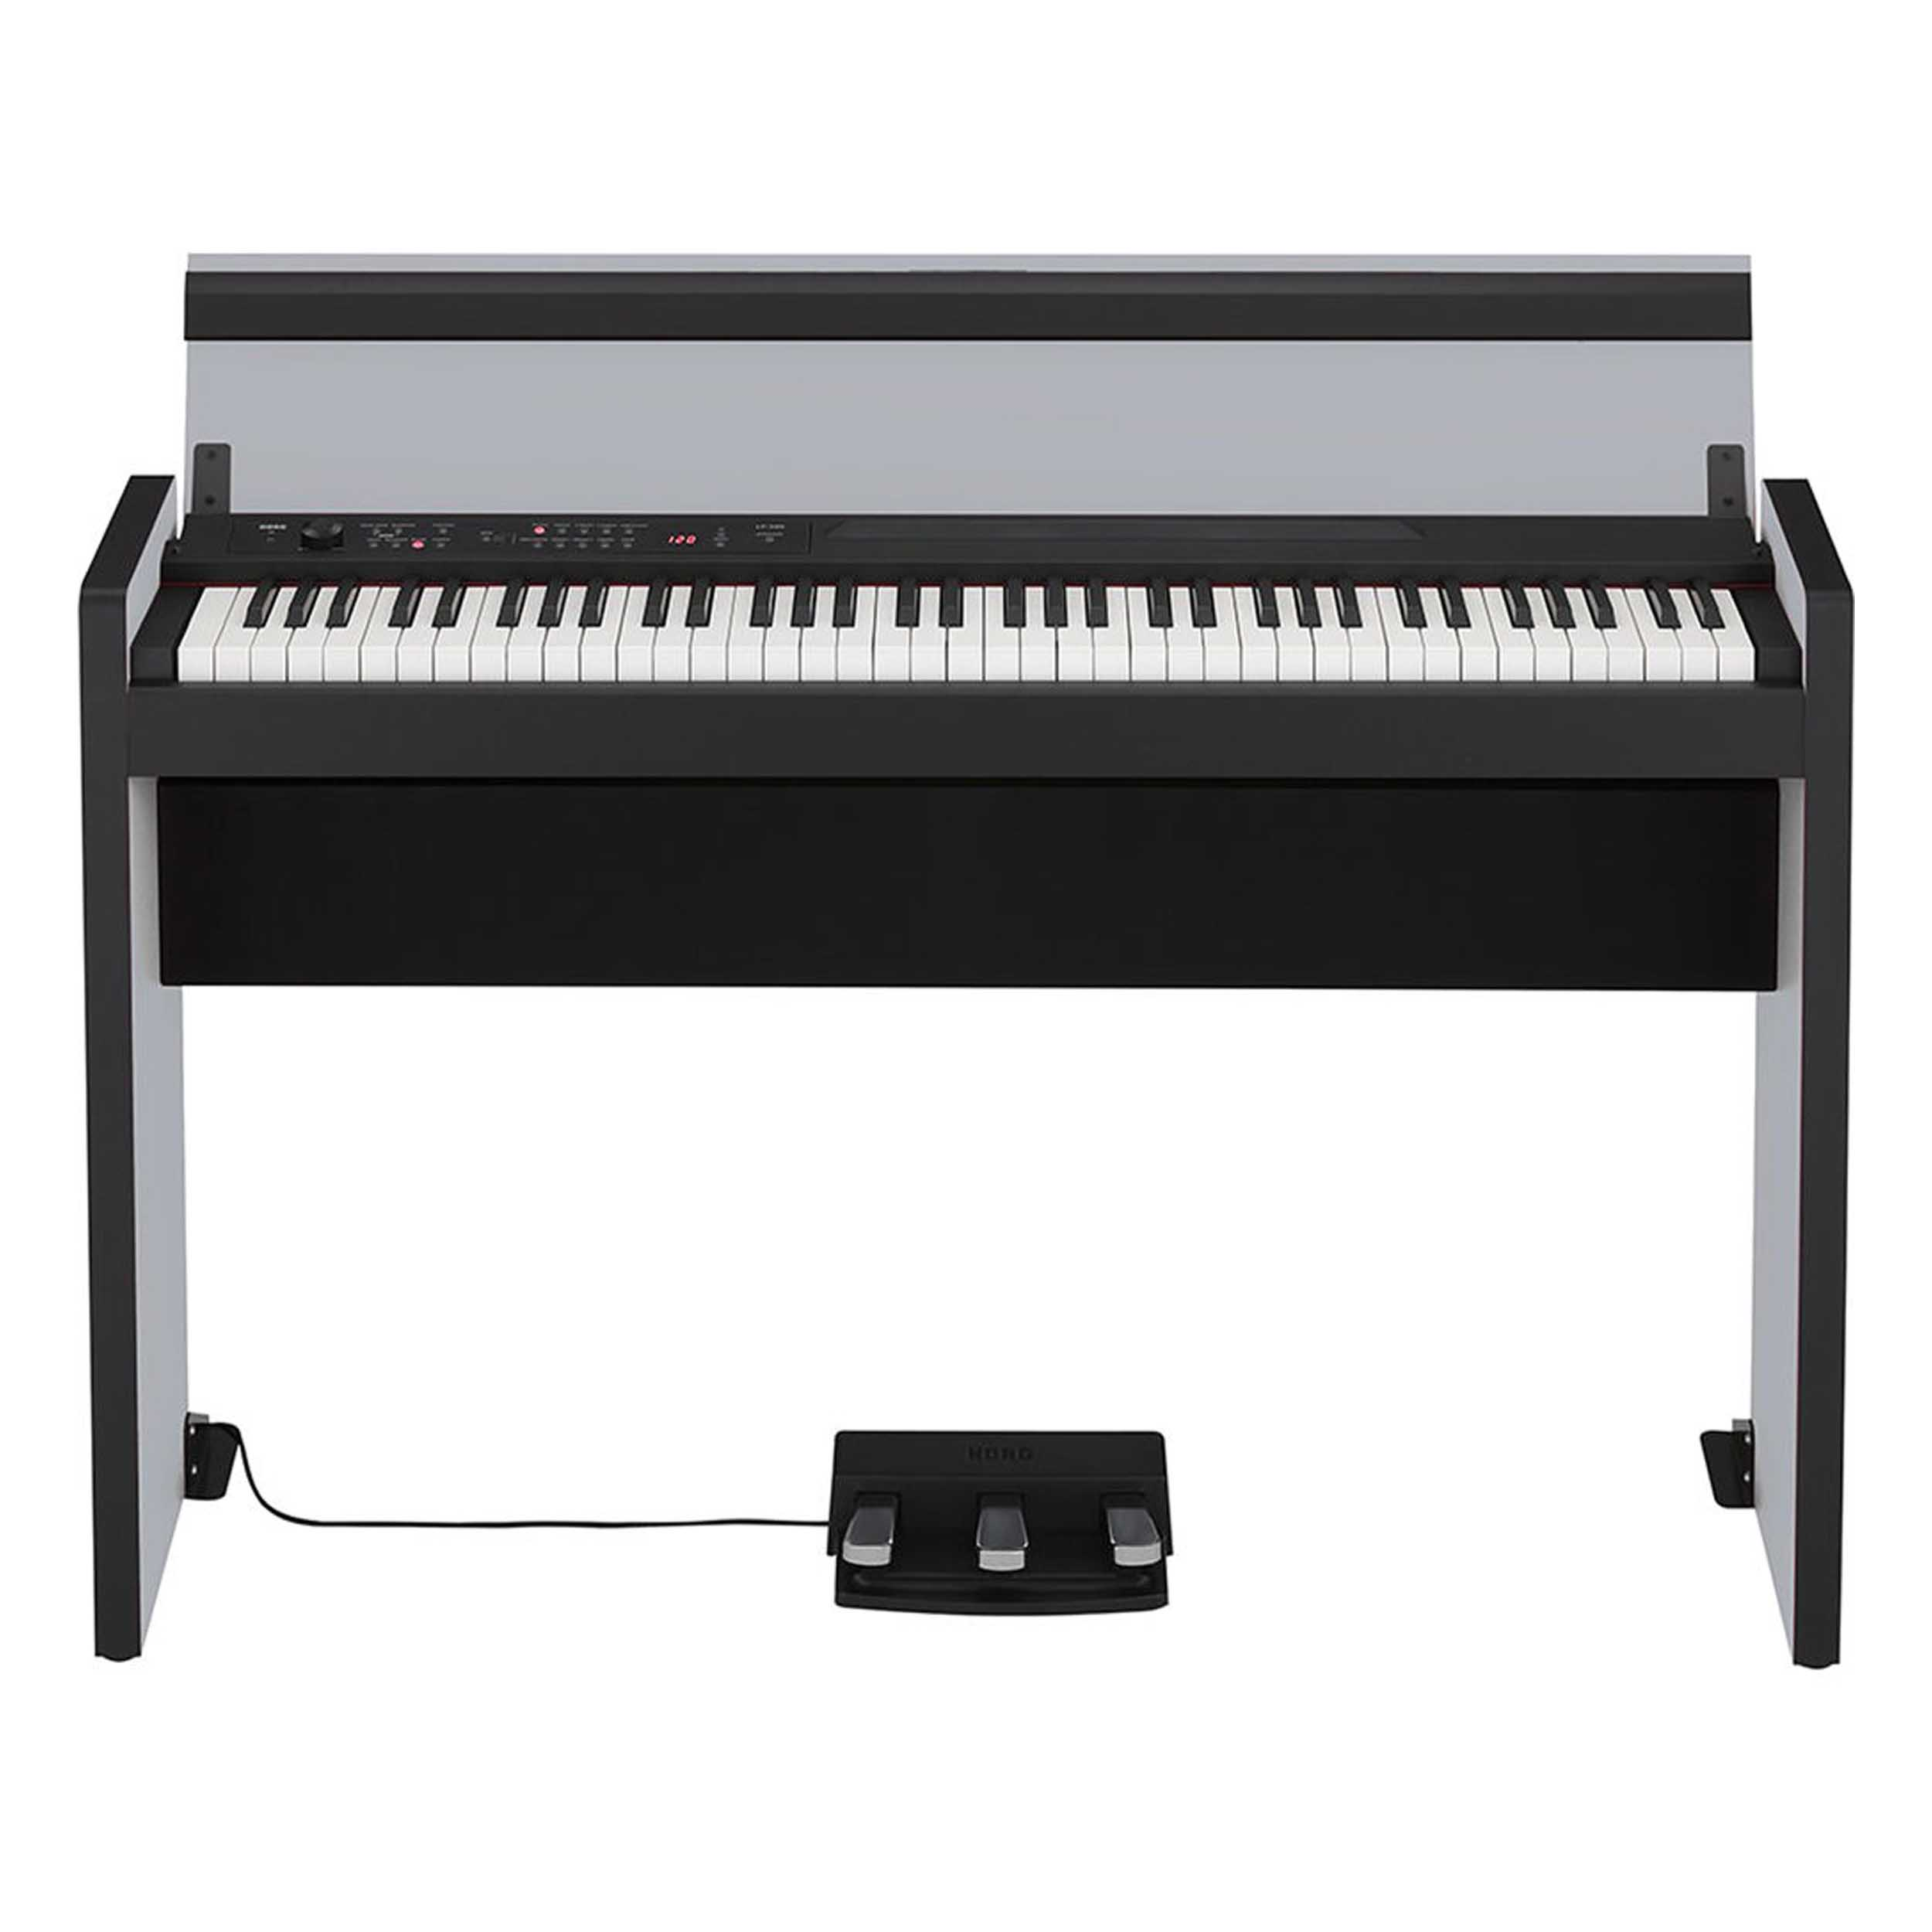 korg lp 380 73 key digital piano in silver black ebay. Black Bedroom Furniture Sets. Home Design Ideas